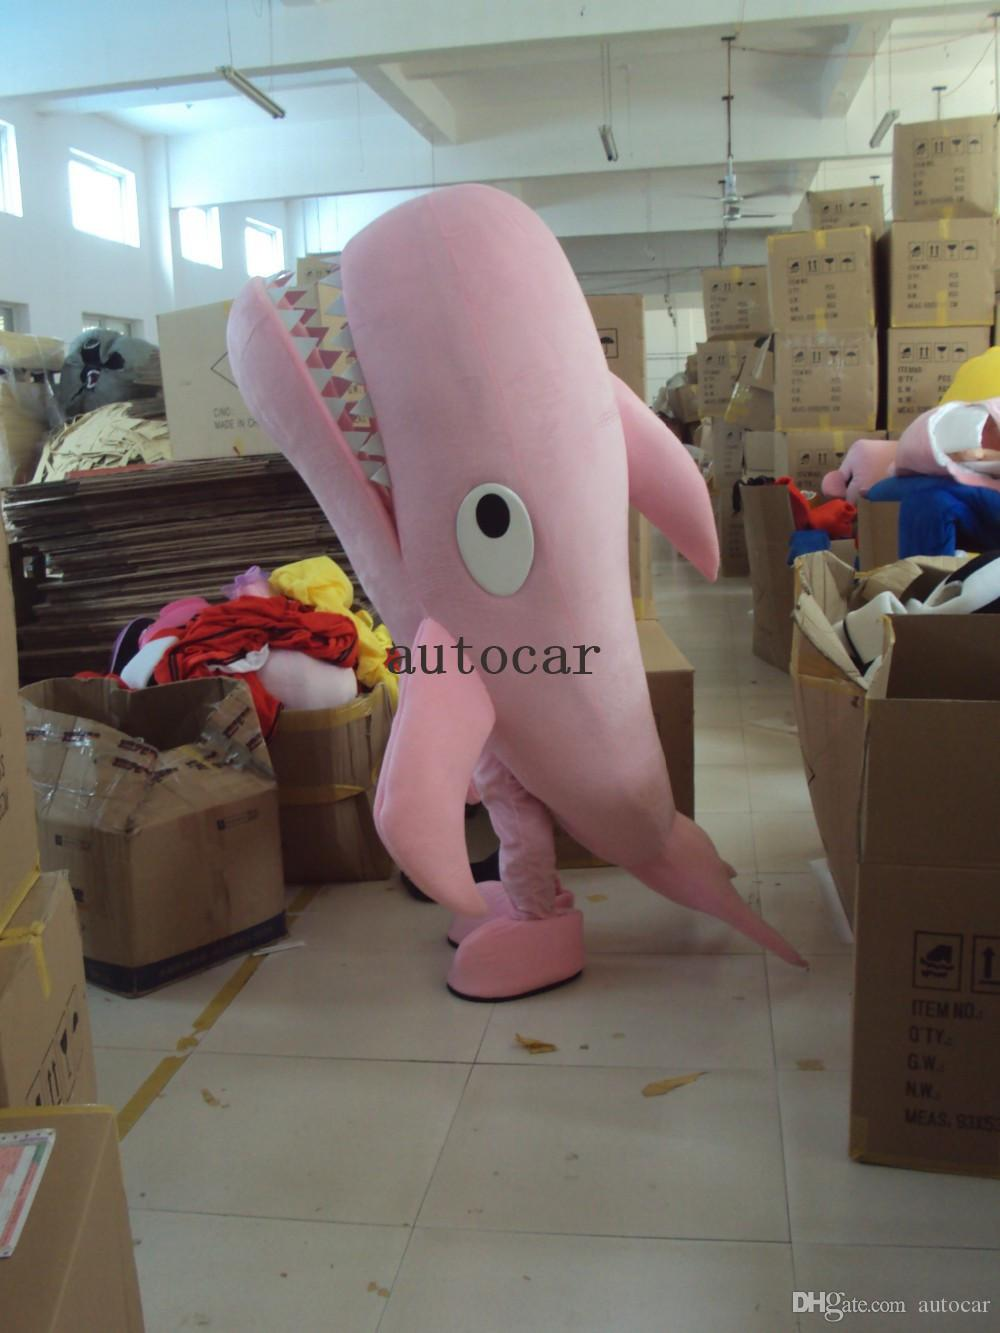 Розовый акула костюм талисмана взрослых характер костюм талисмана как мода бесплатная доставка